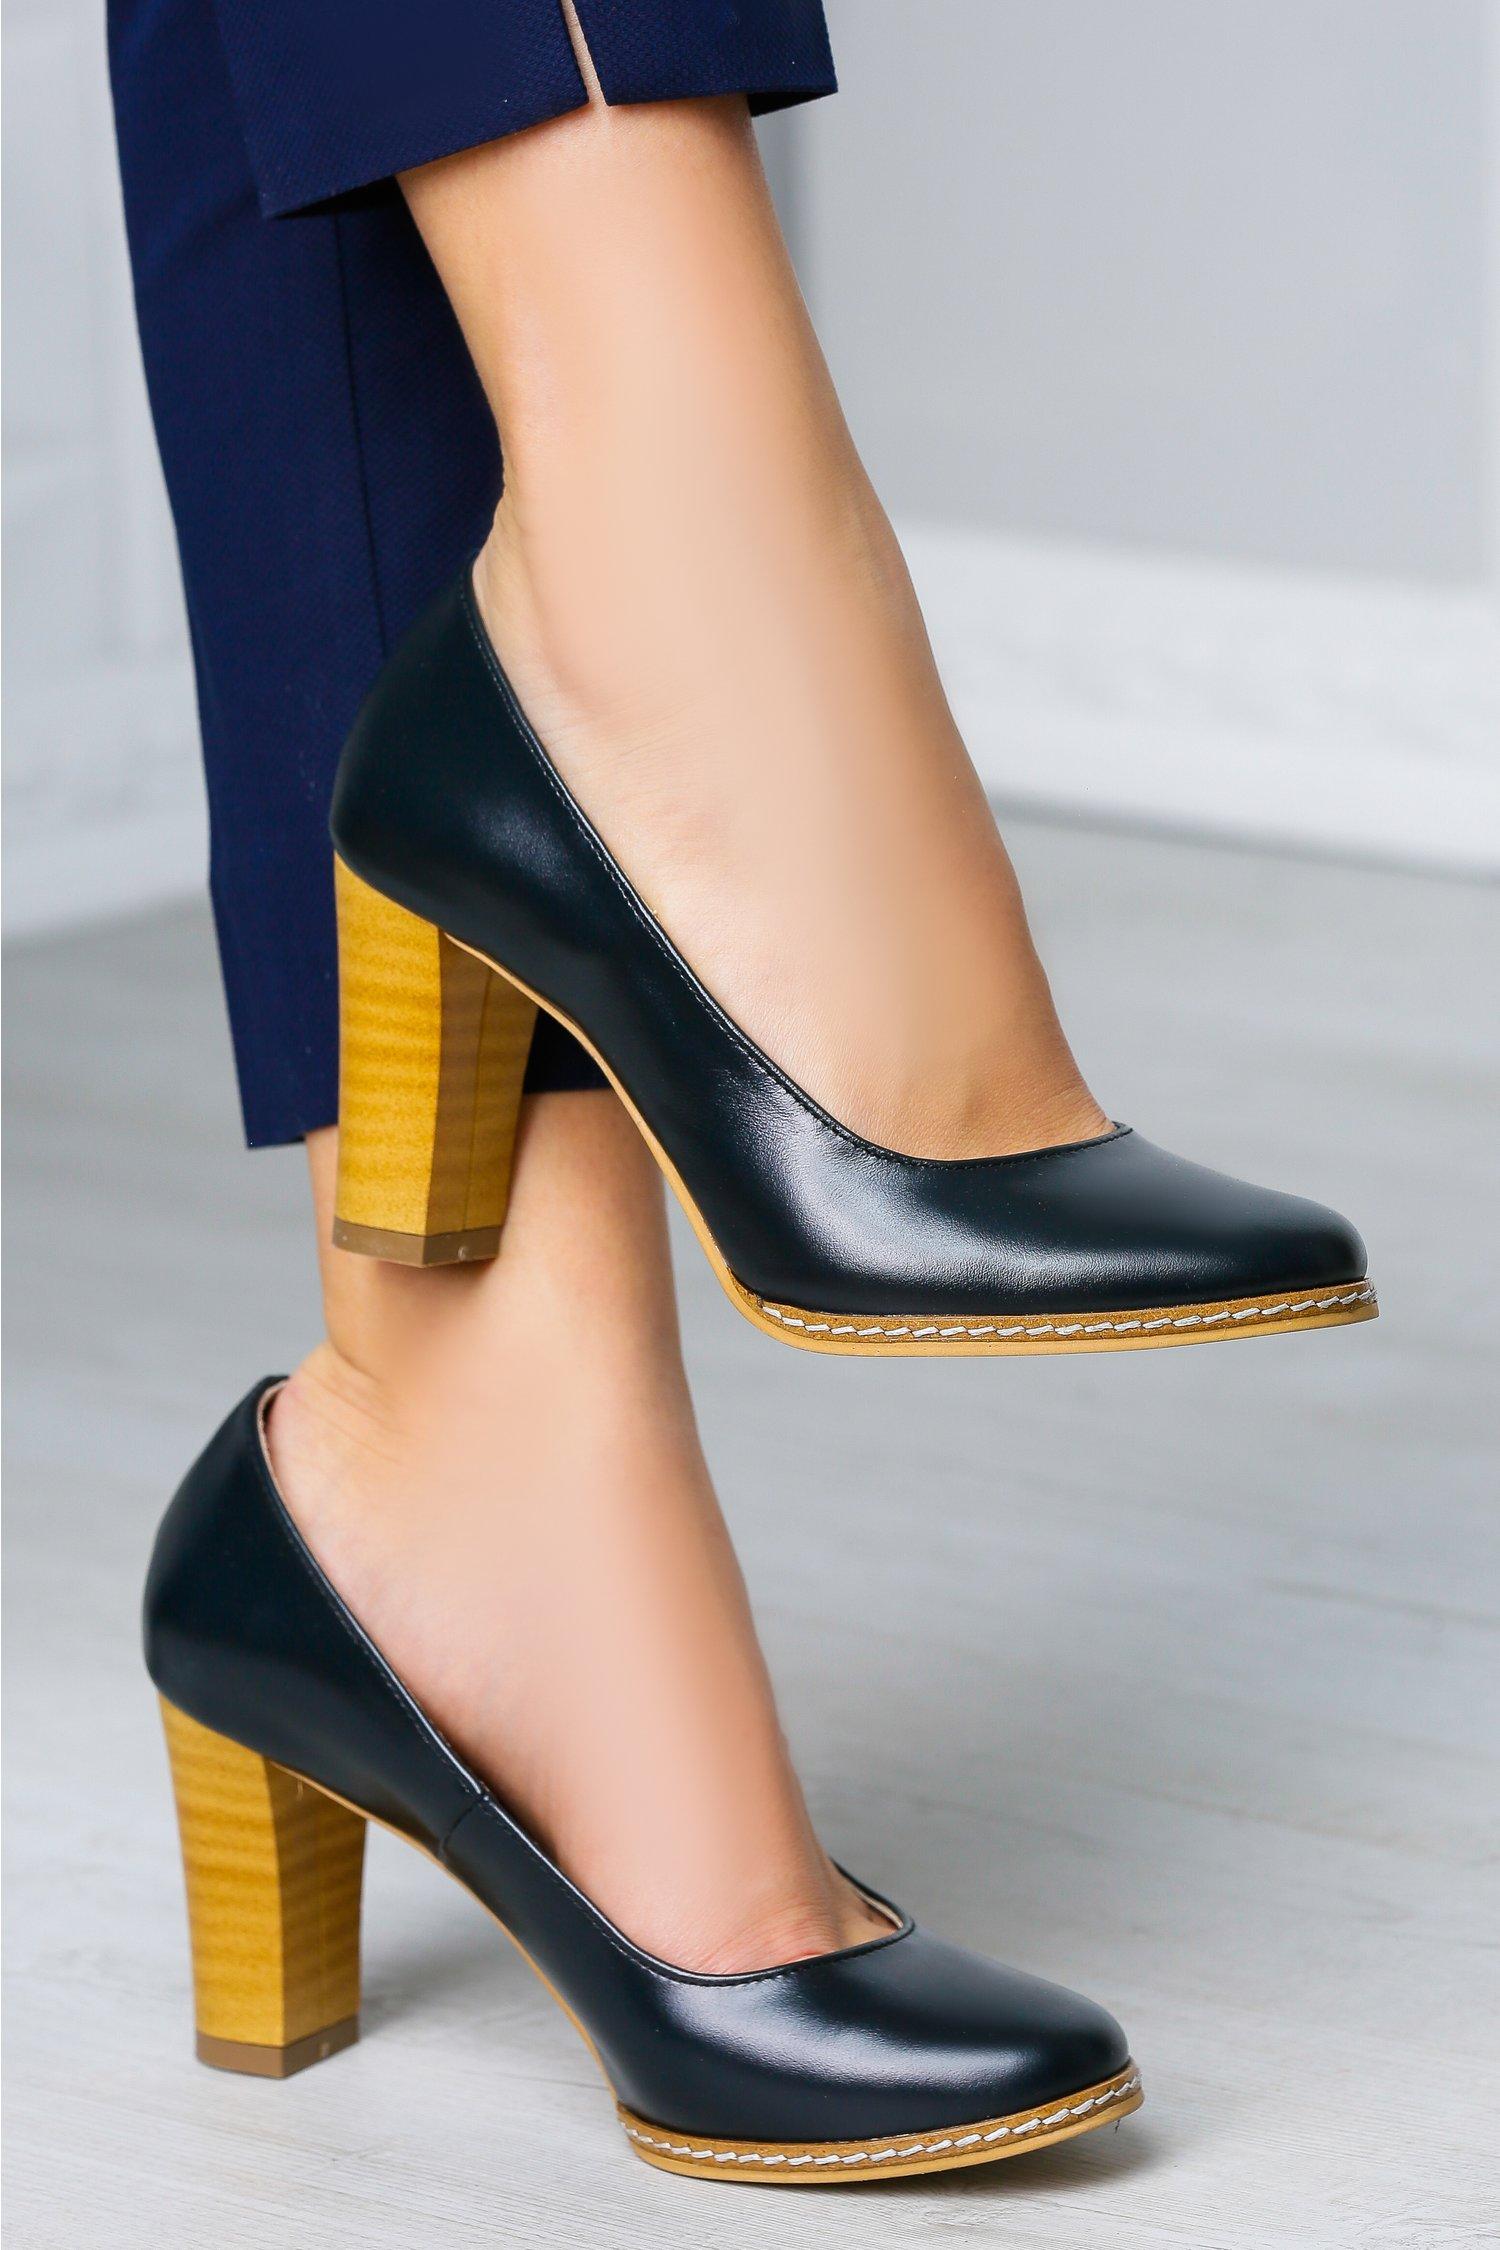 Pantofi Arabela bleumarin office cu toc maro